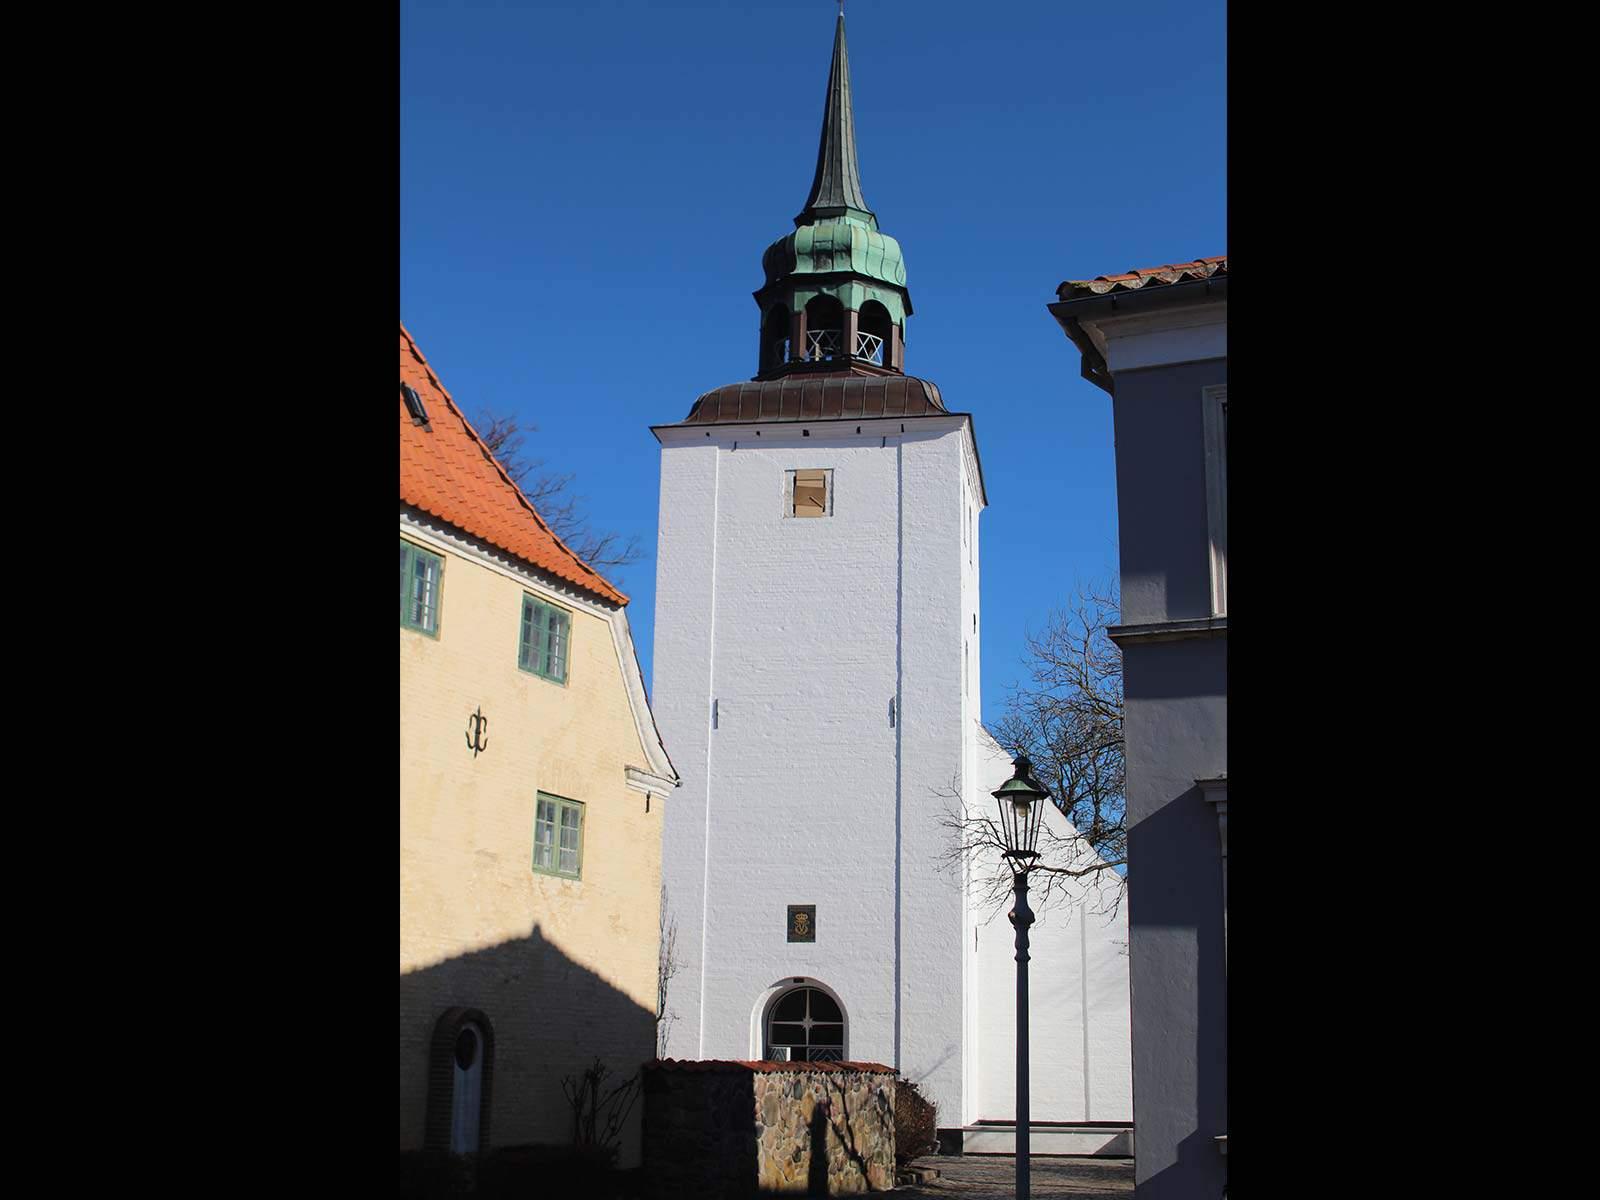 Ærøskøbing Kirke spir